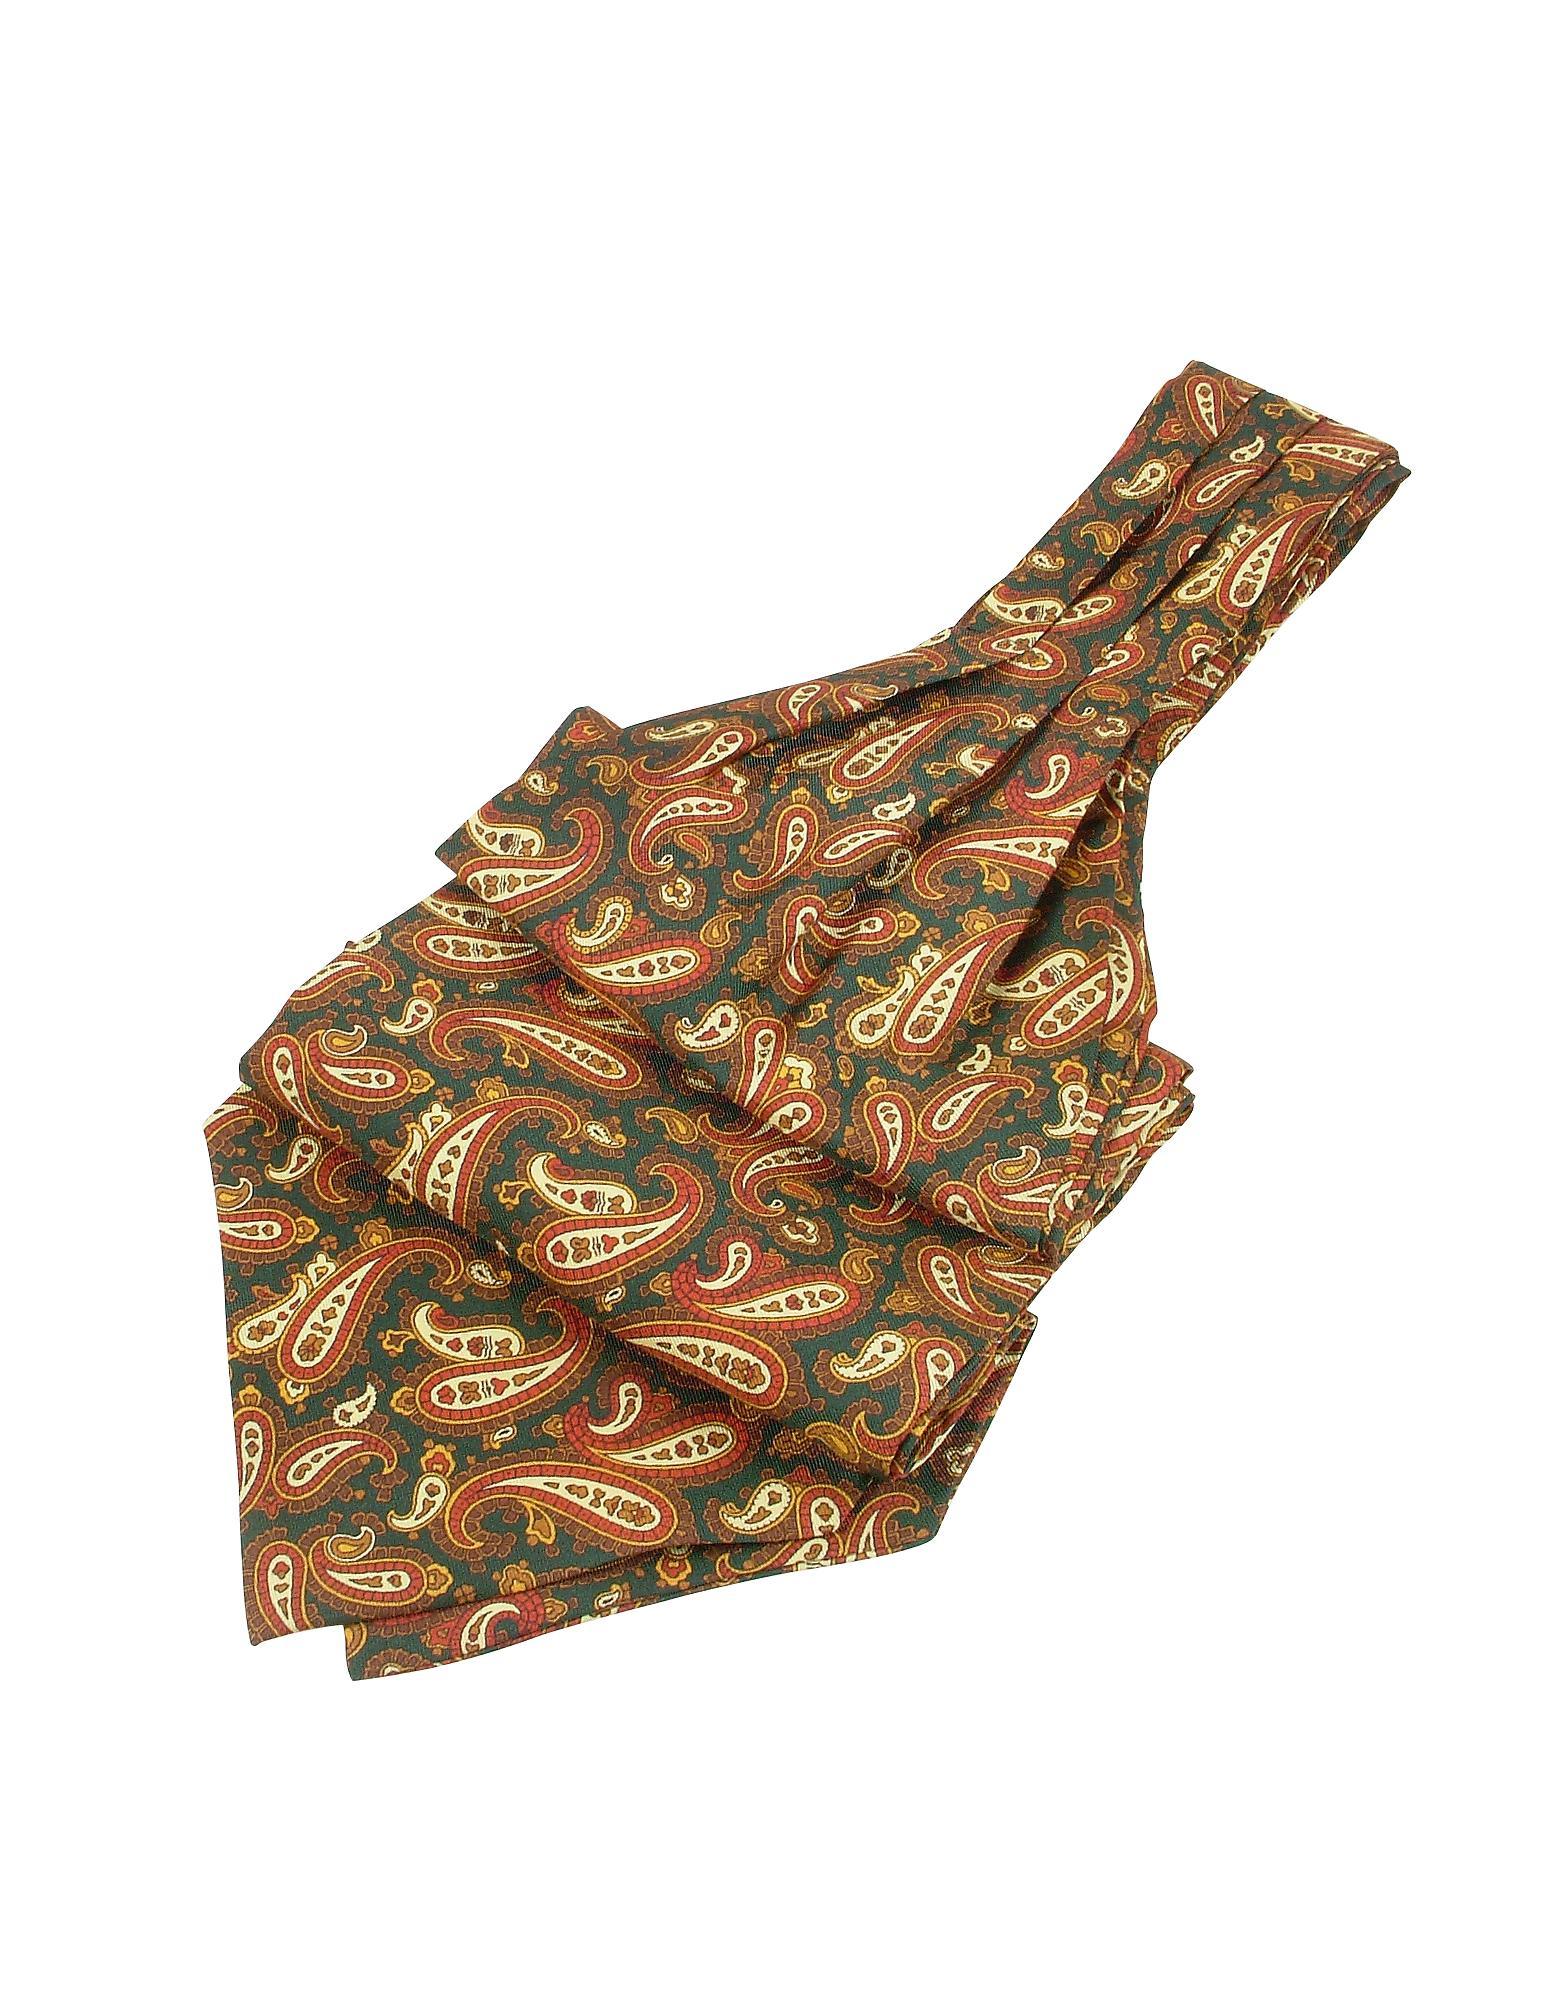 b96a53a2200b Forzieri - Green Paisley Print Twill Silk Ascot for Men - Lyst. View  fullscreen